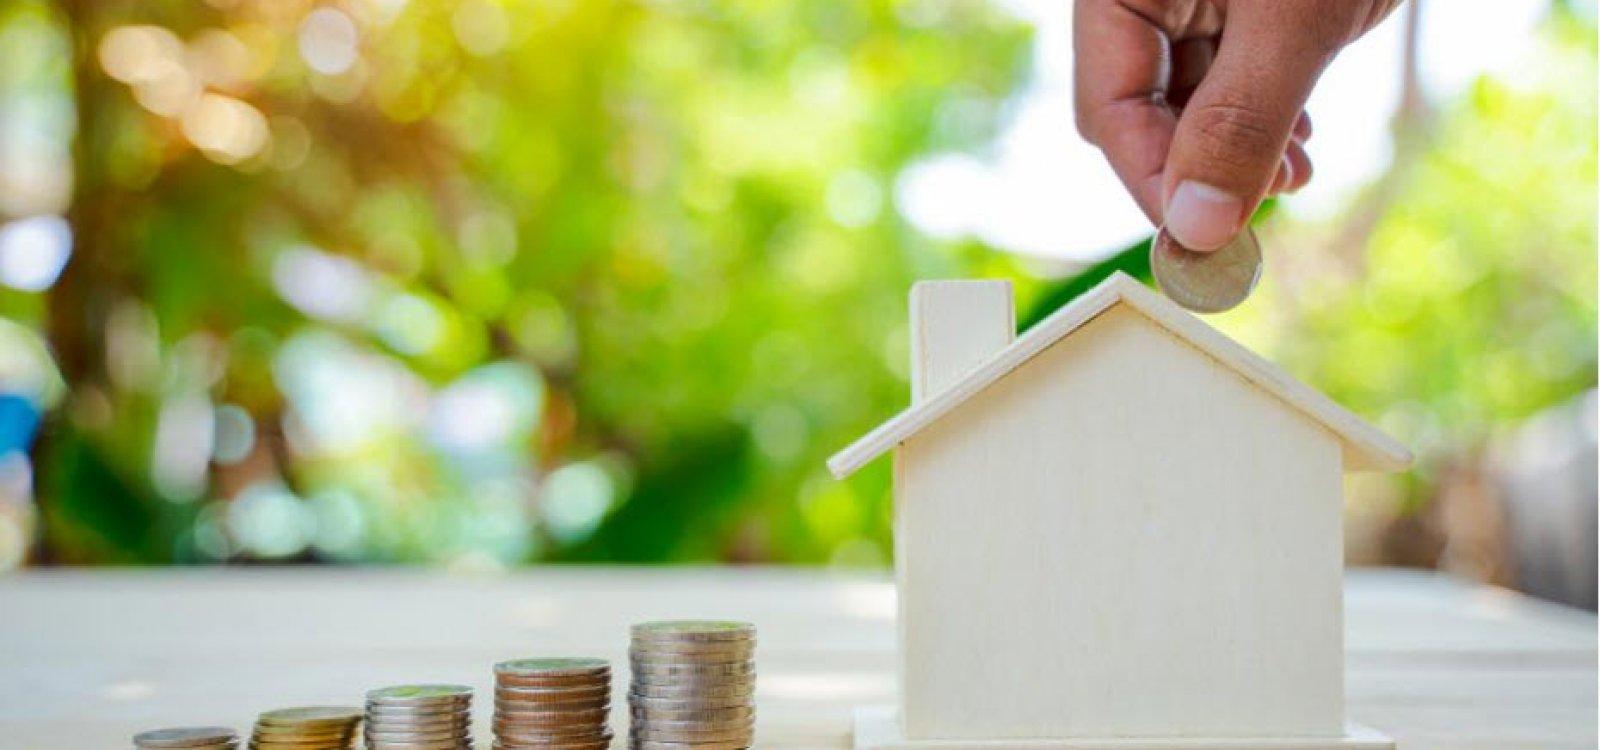 How to Diversify Your Real Estate Portfolio